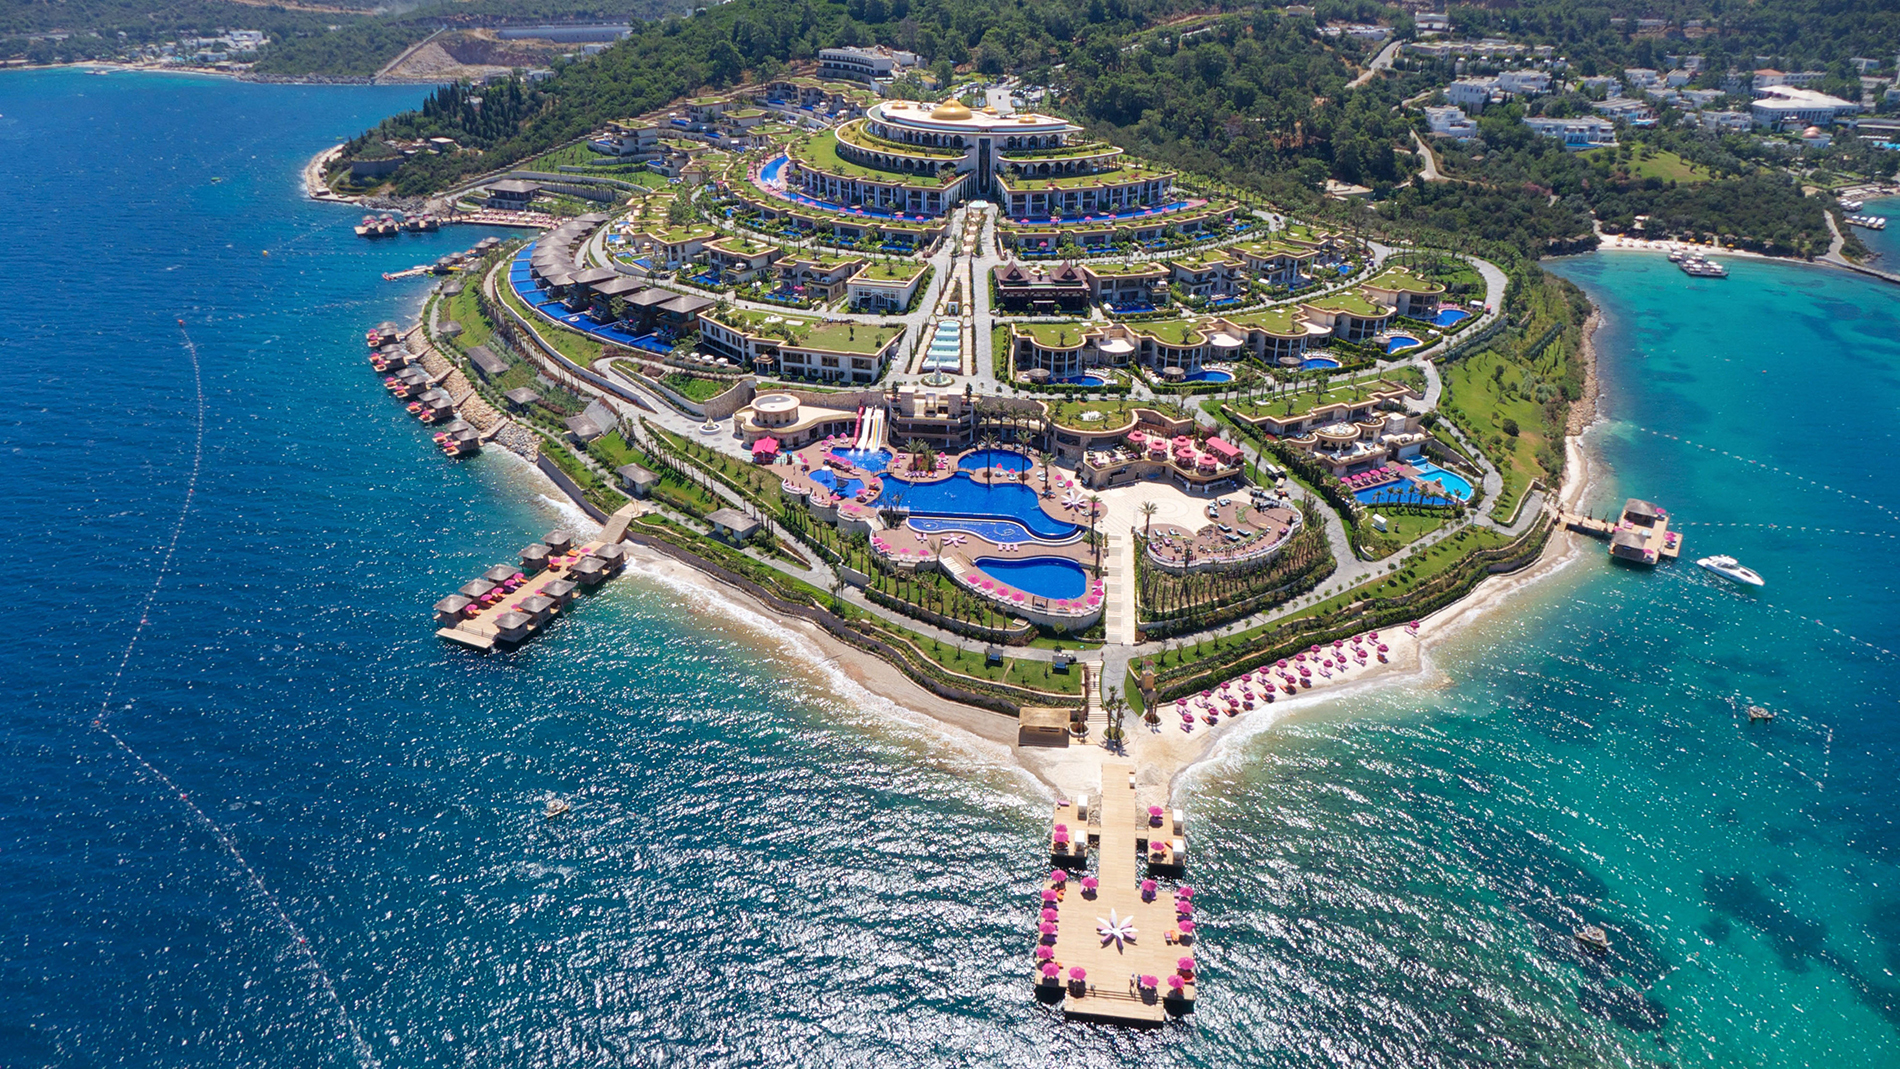 The Best Hotel In Turkey